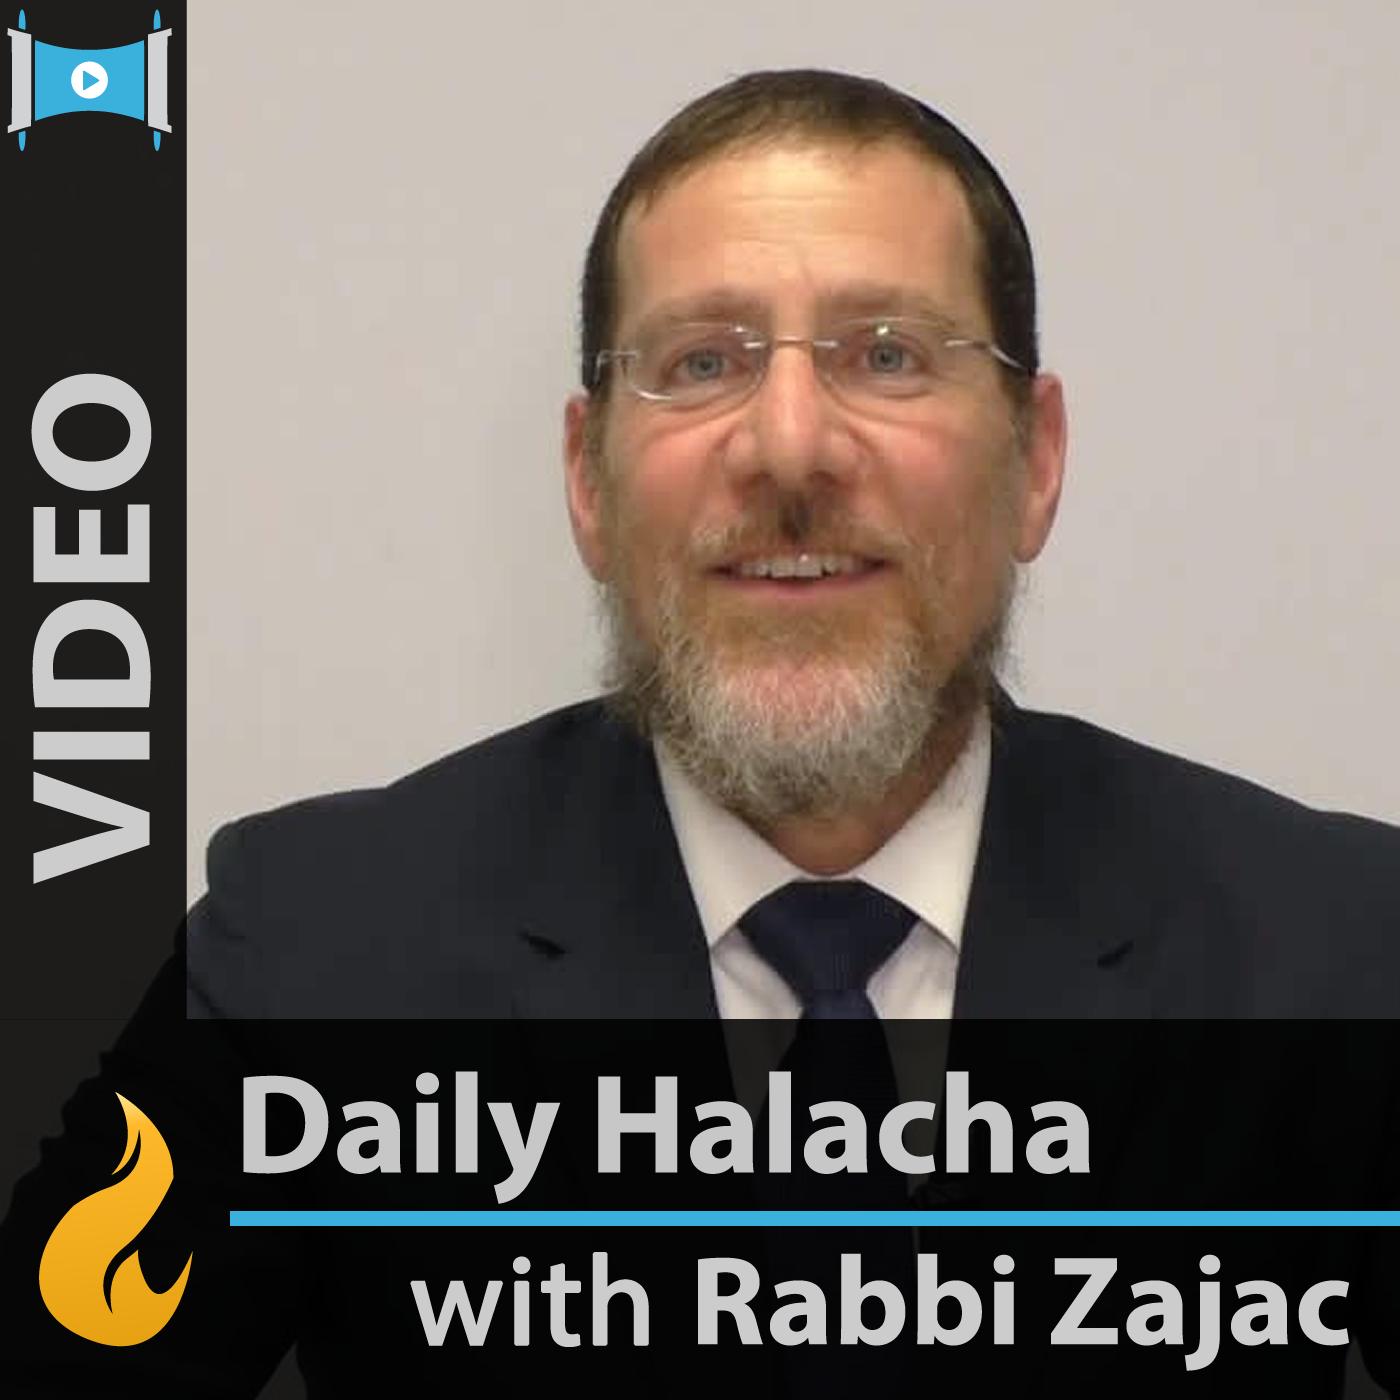 Daily Halachah (Video)